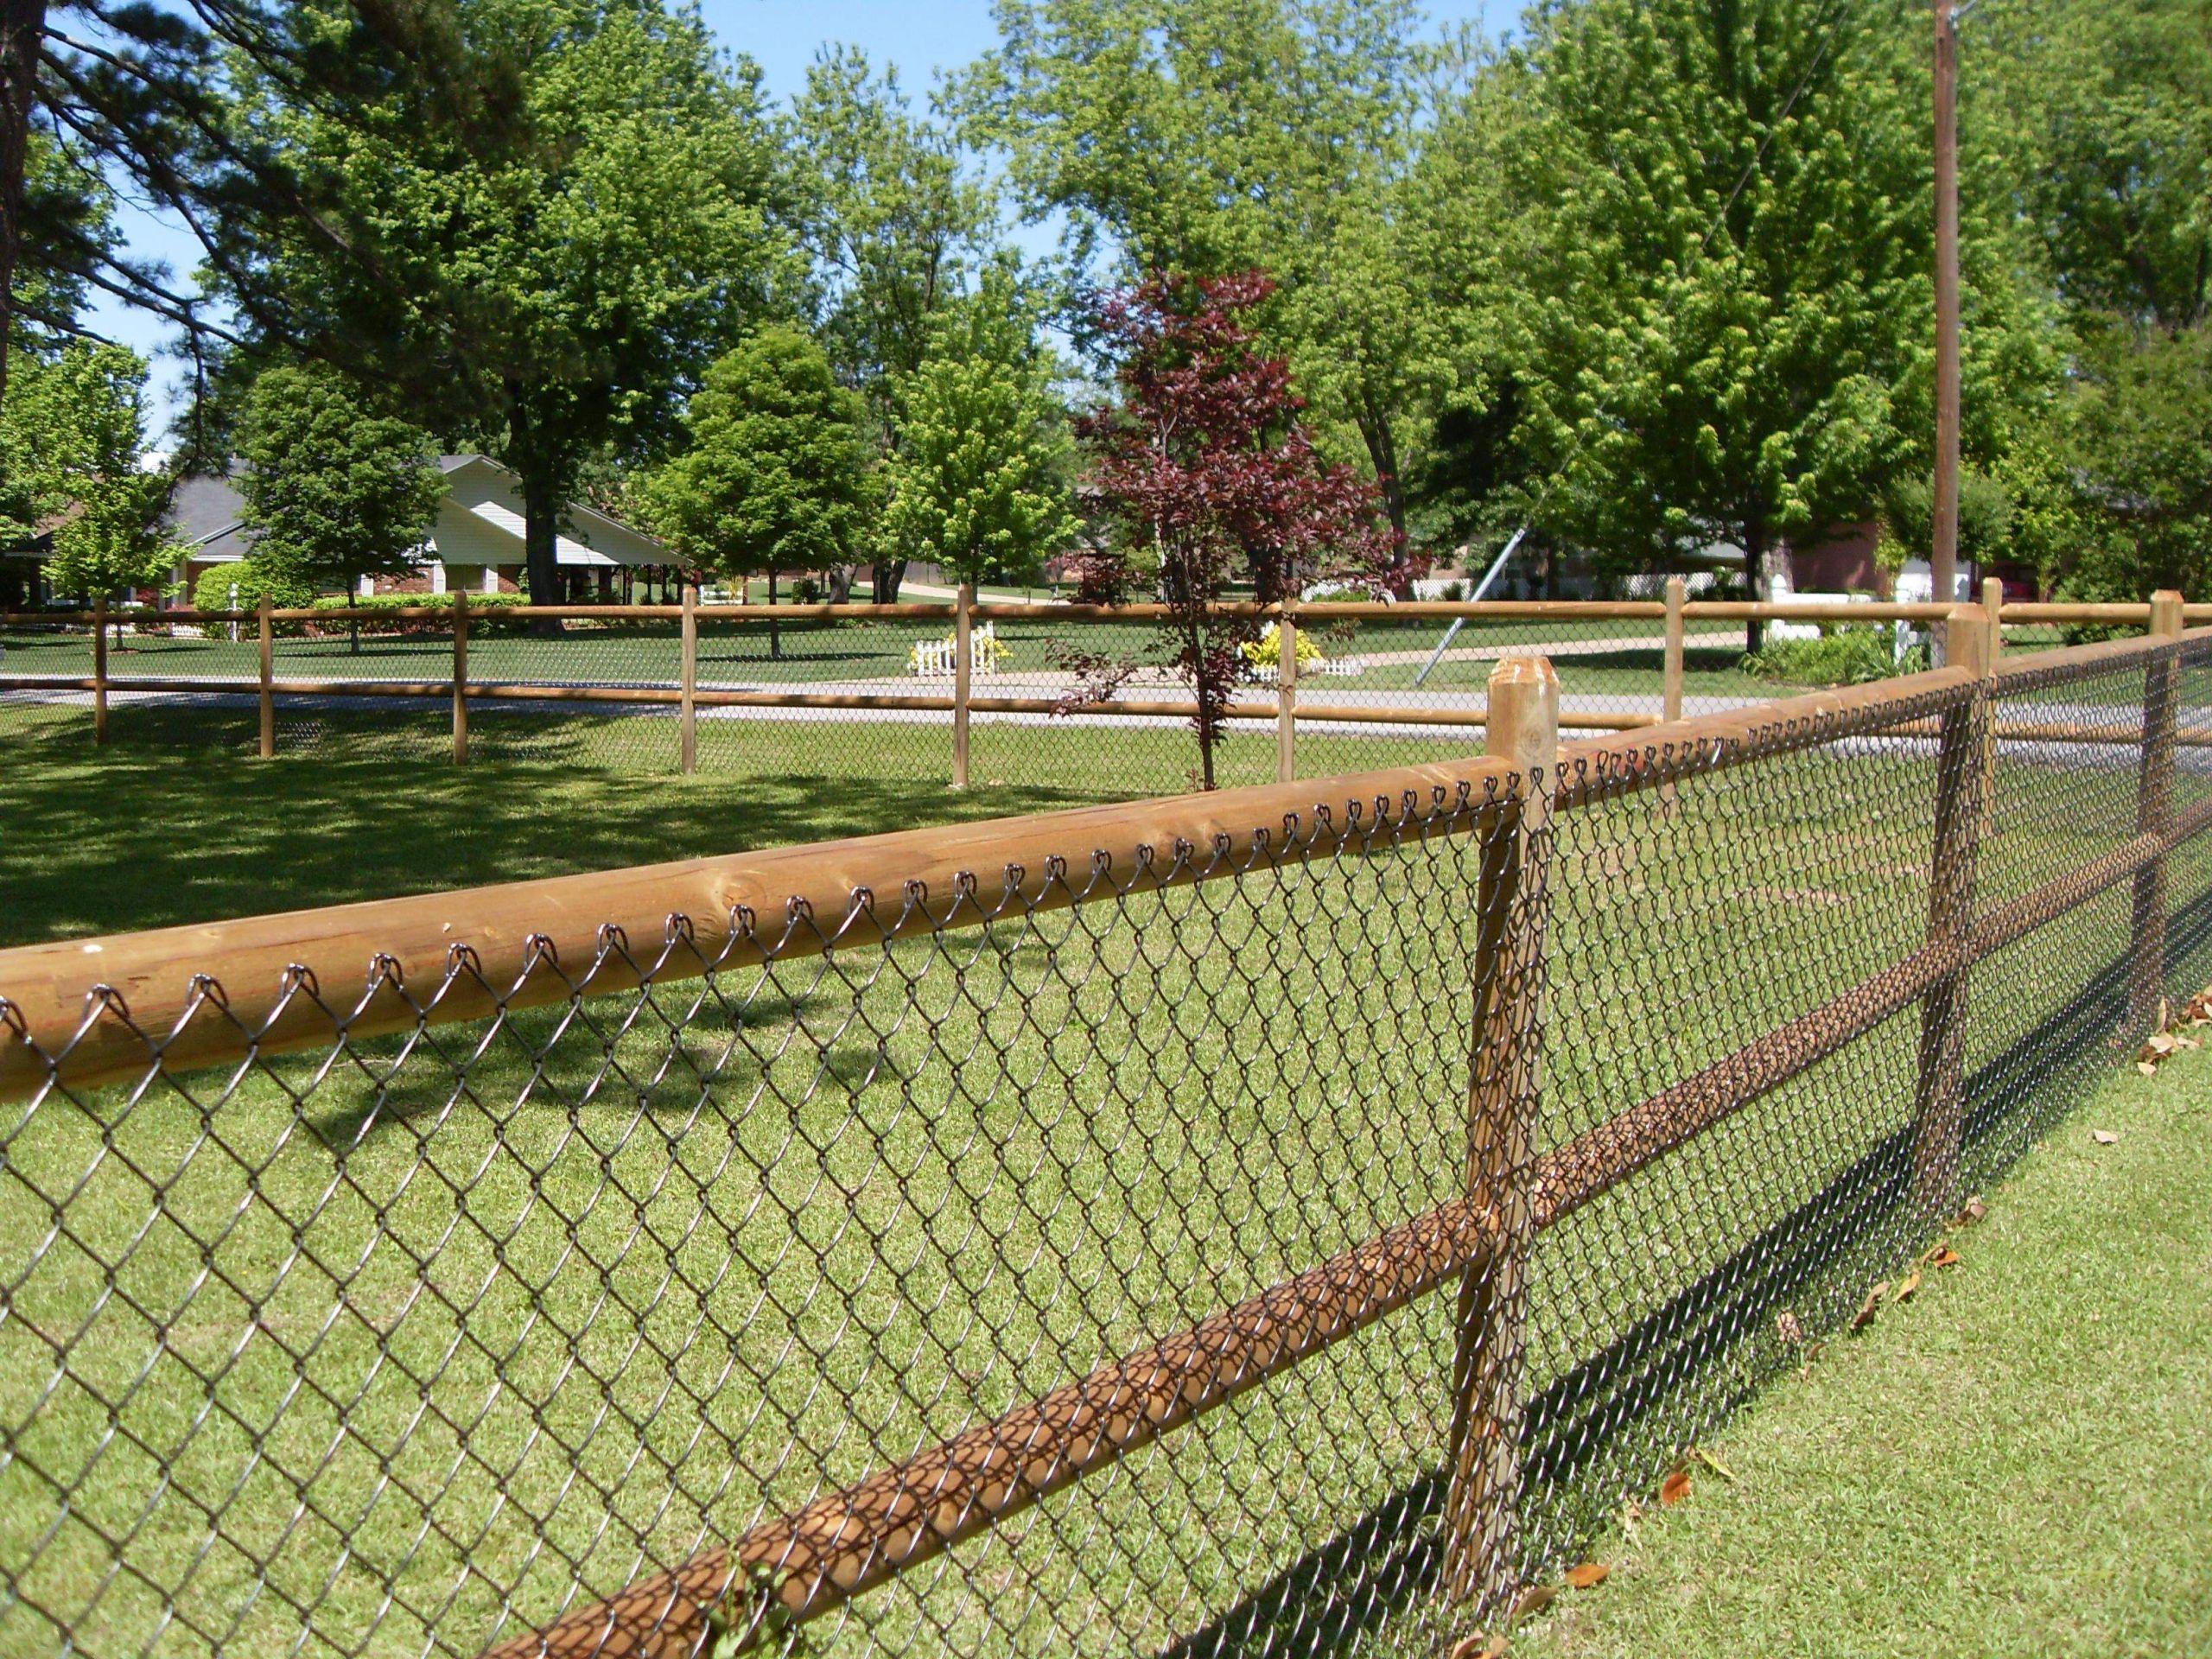 Hundezaun Garten Neu 2 Rail Wood Fence with Chain Link